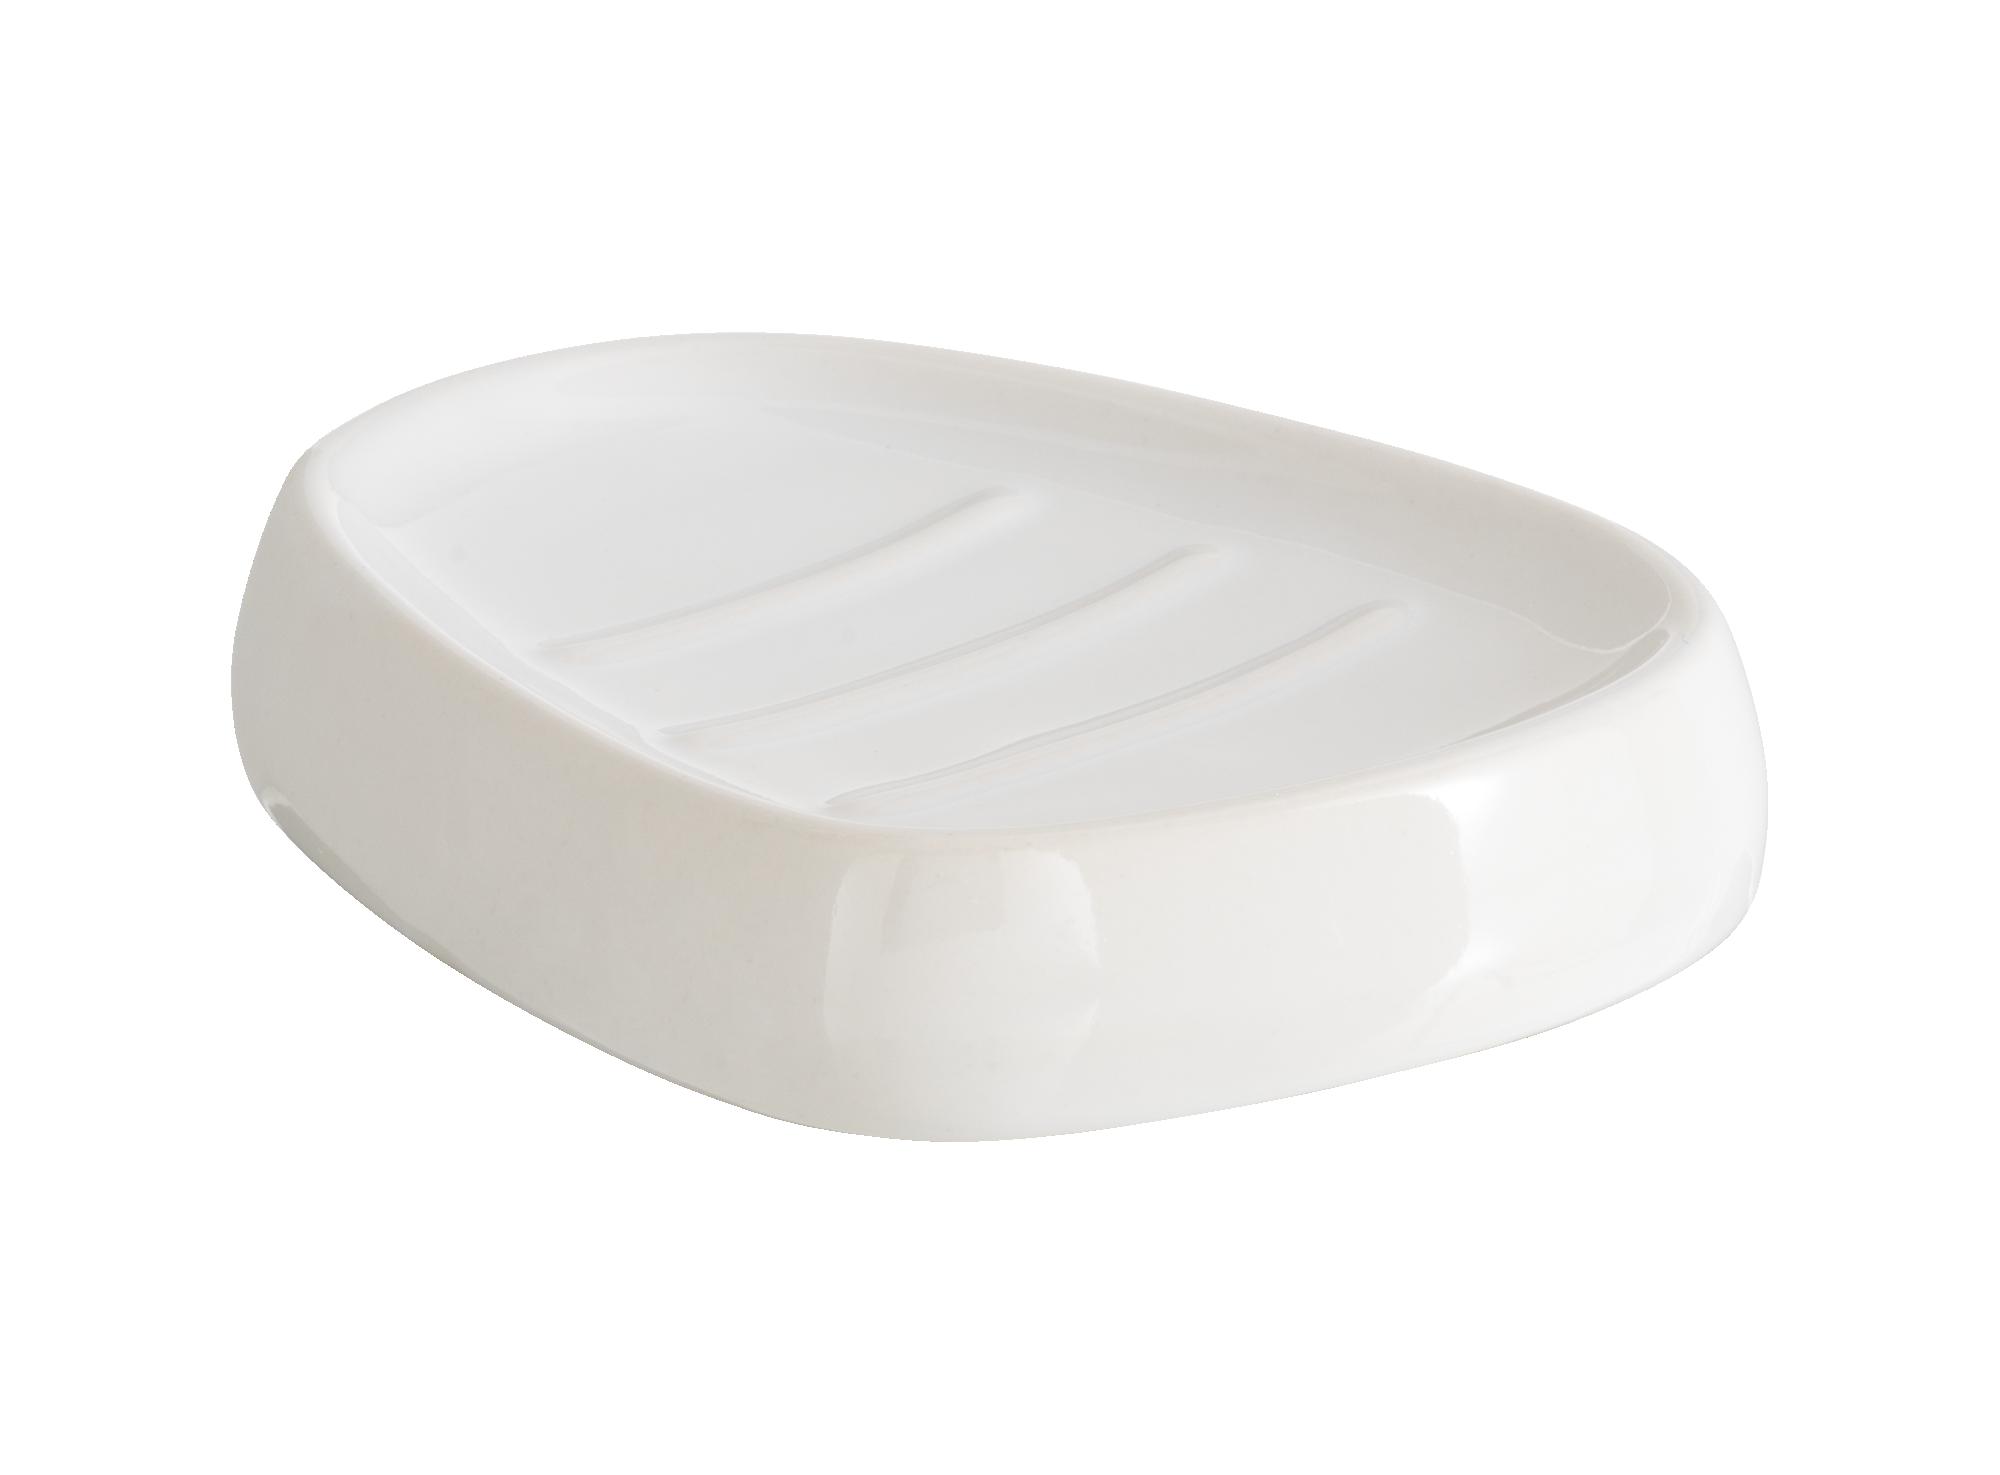 Porte savon blanc en ceramique 12x9.5cm